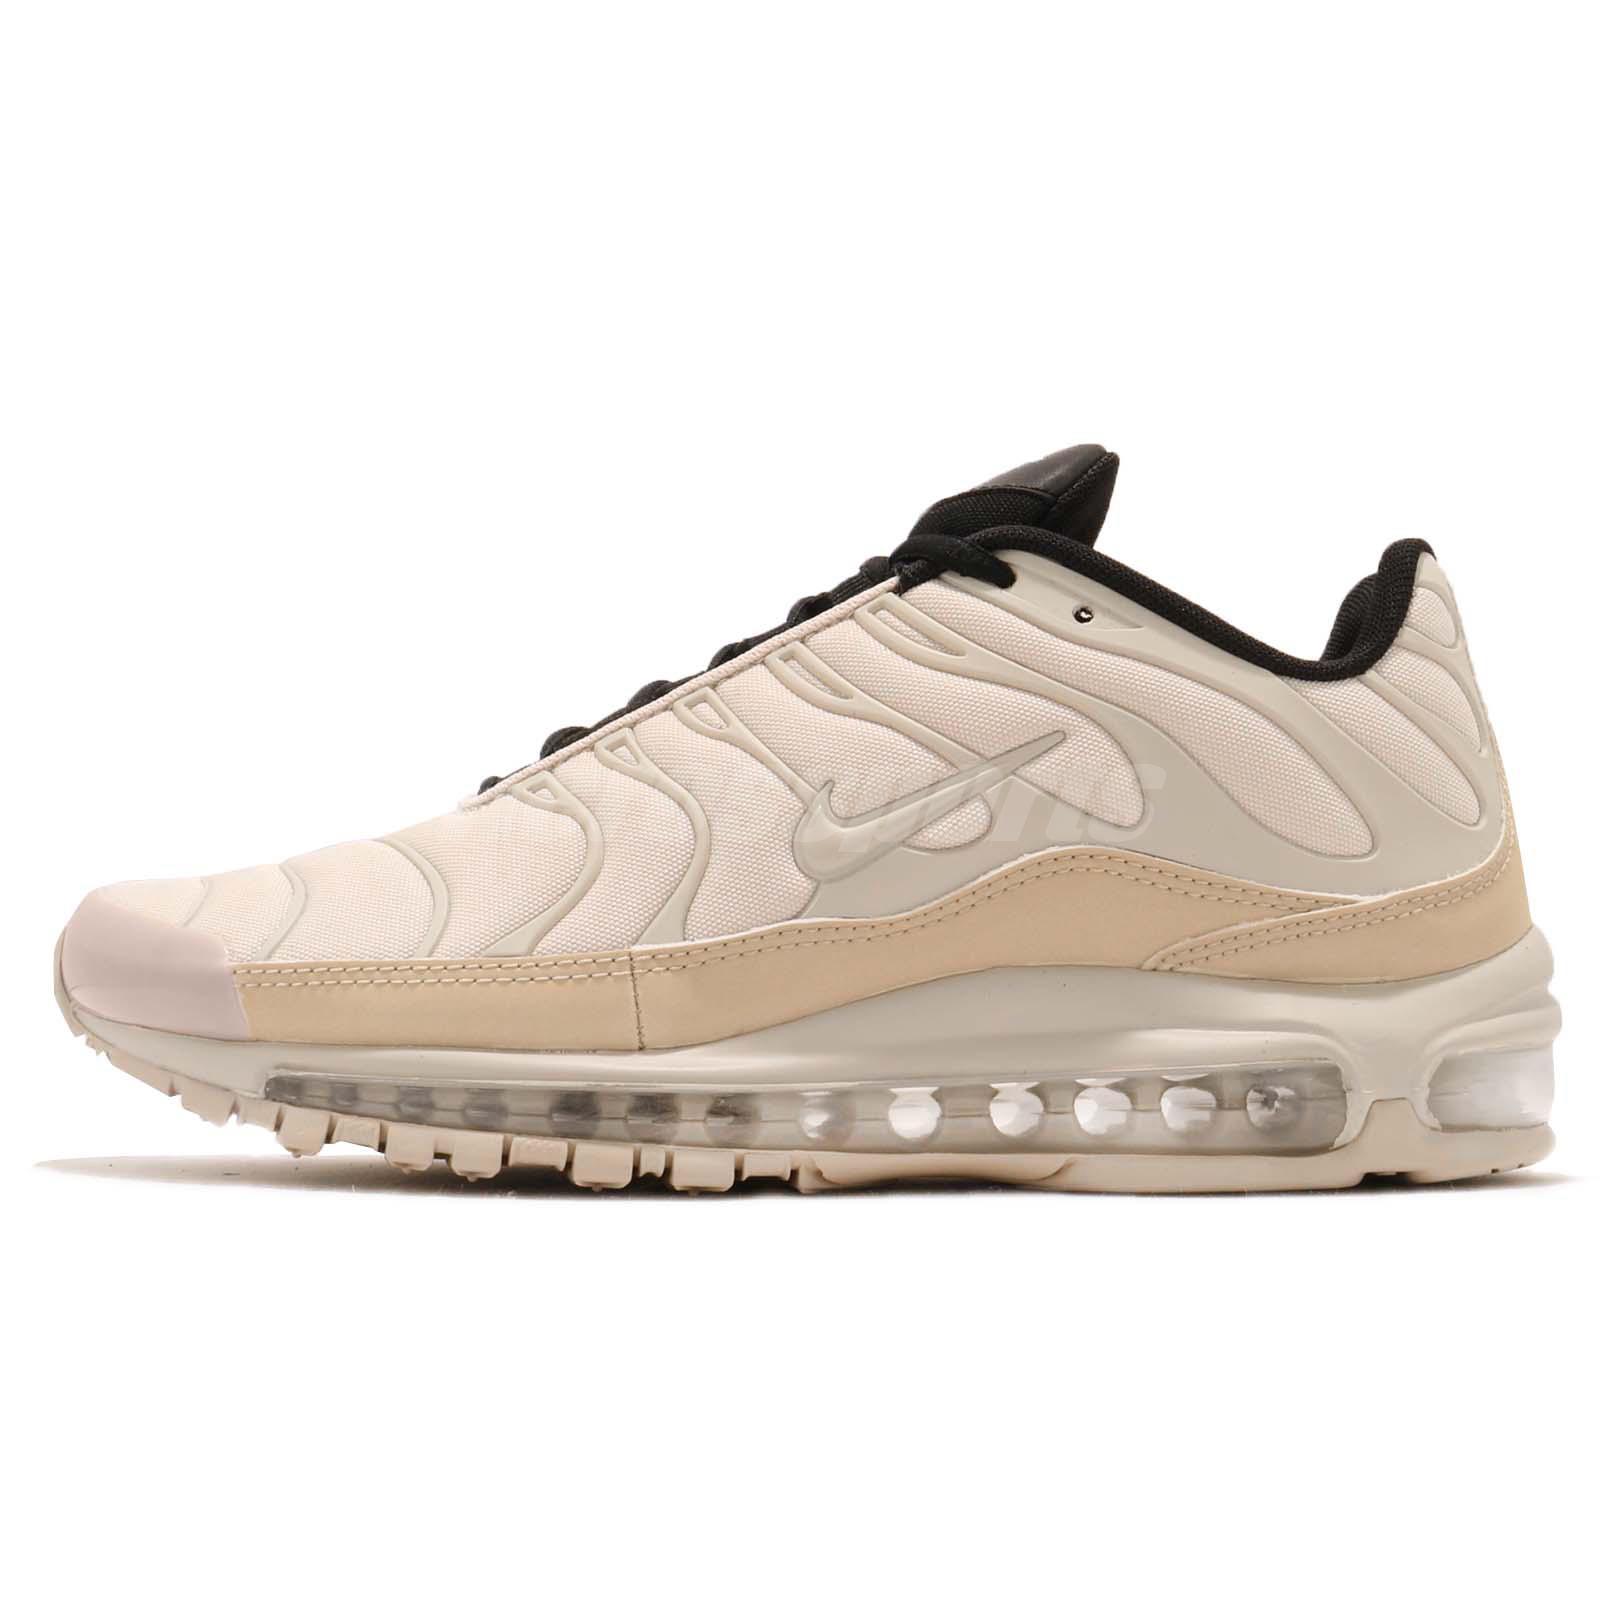 857af5dbac37ff Nike Air Max 97 Plus Orewood Brown Reflective Mnes Running Shoes AH8144-101